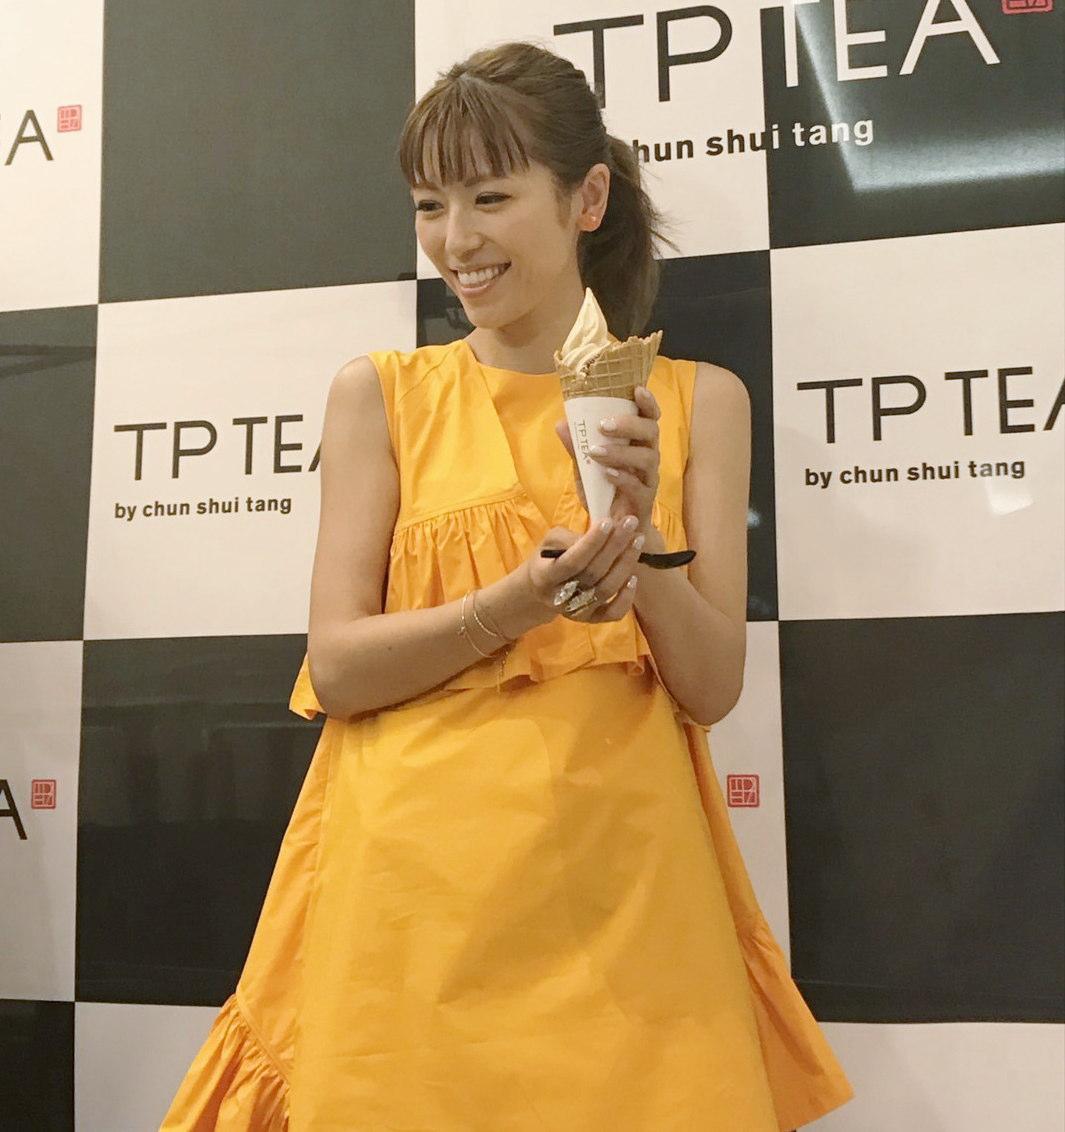 tp-tea3